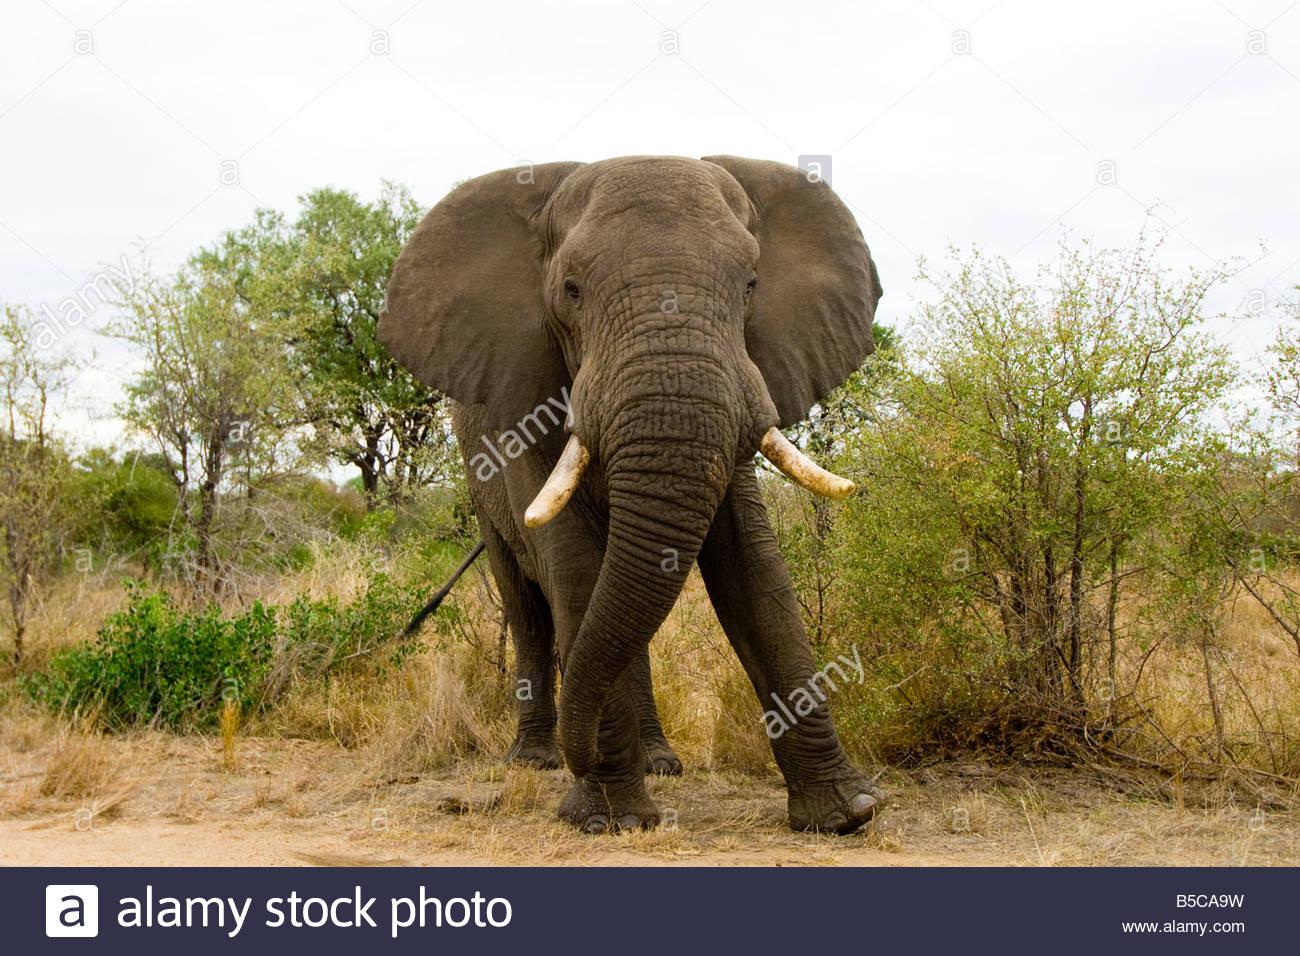 Bull Elephant Parc National Kruger en Afrique du Sud Photo Stock